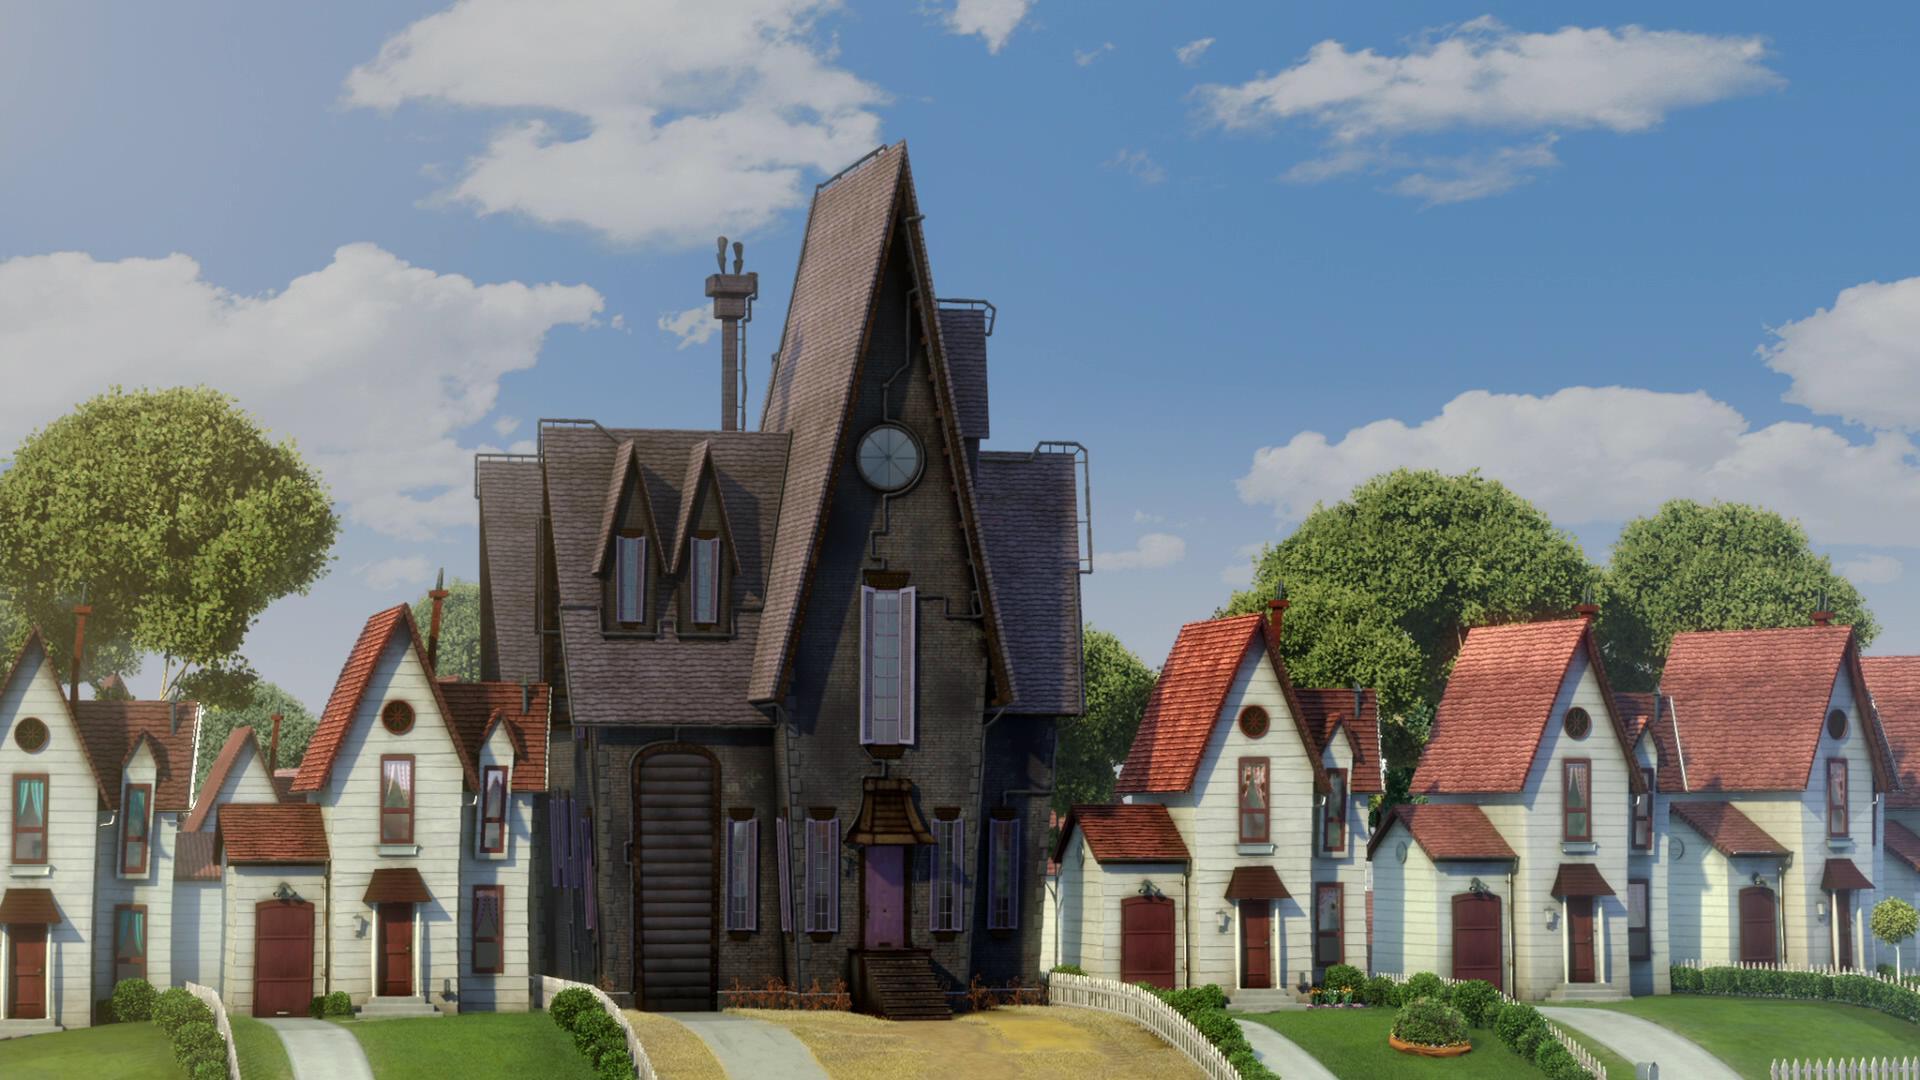 Gru's House